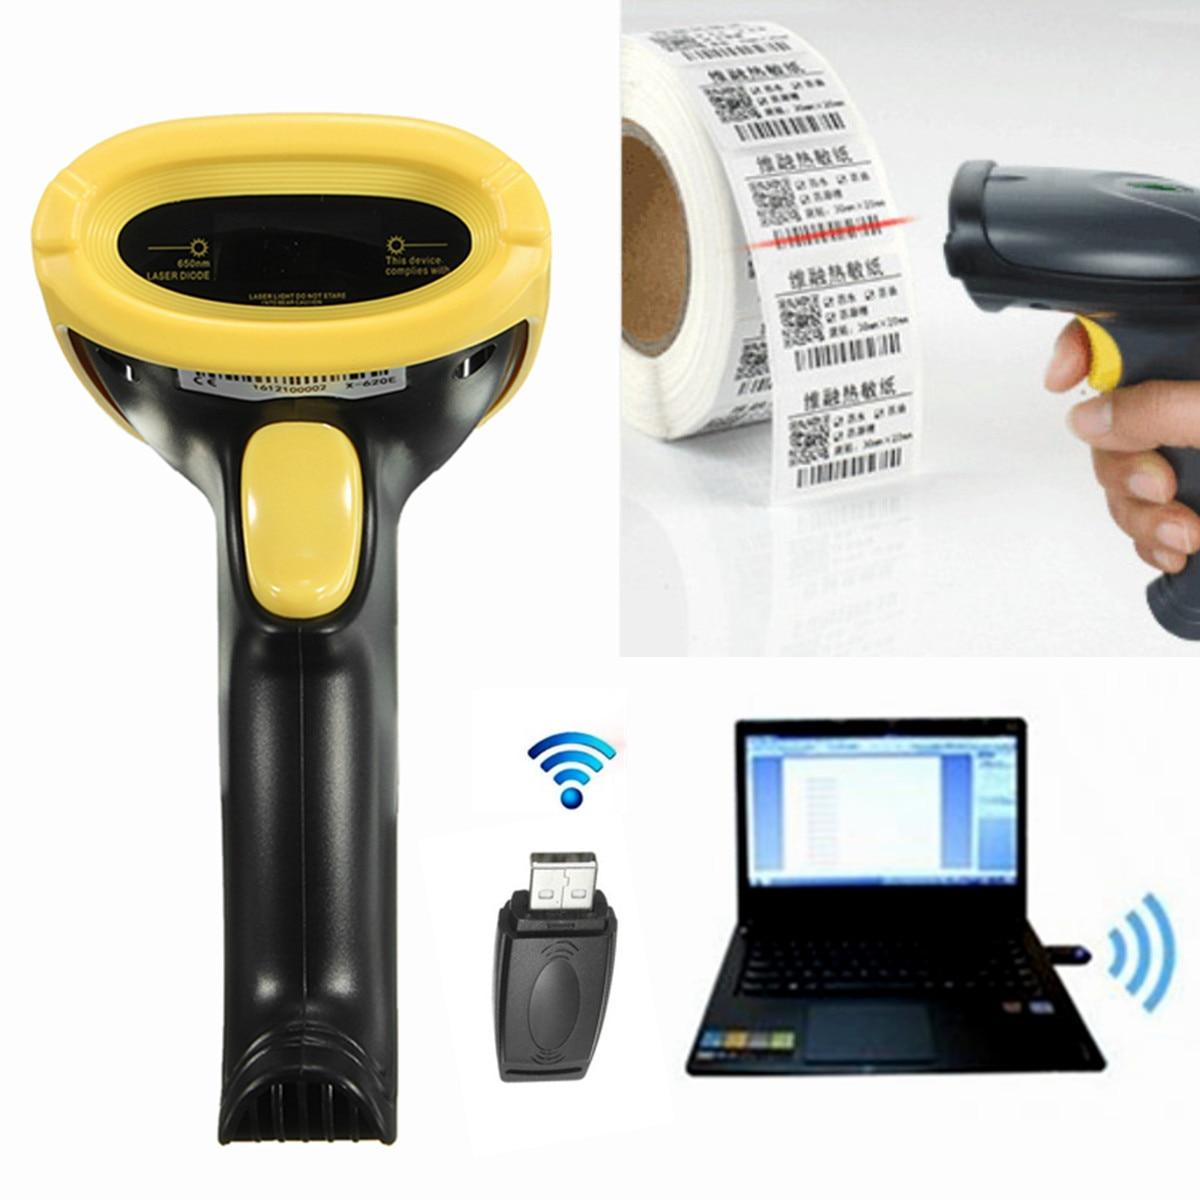 2.4GHz Portable Barcode Scanner USB WIFI Handheld Visible Wireless Laser Cordless Barcode Reader For Supermarket Shop